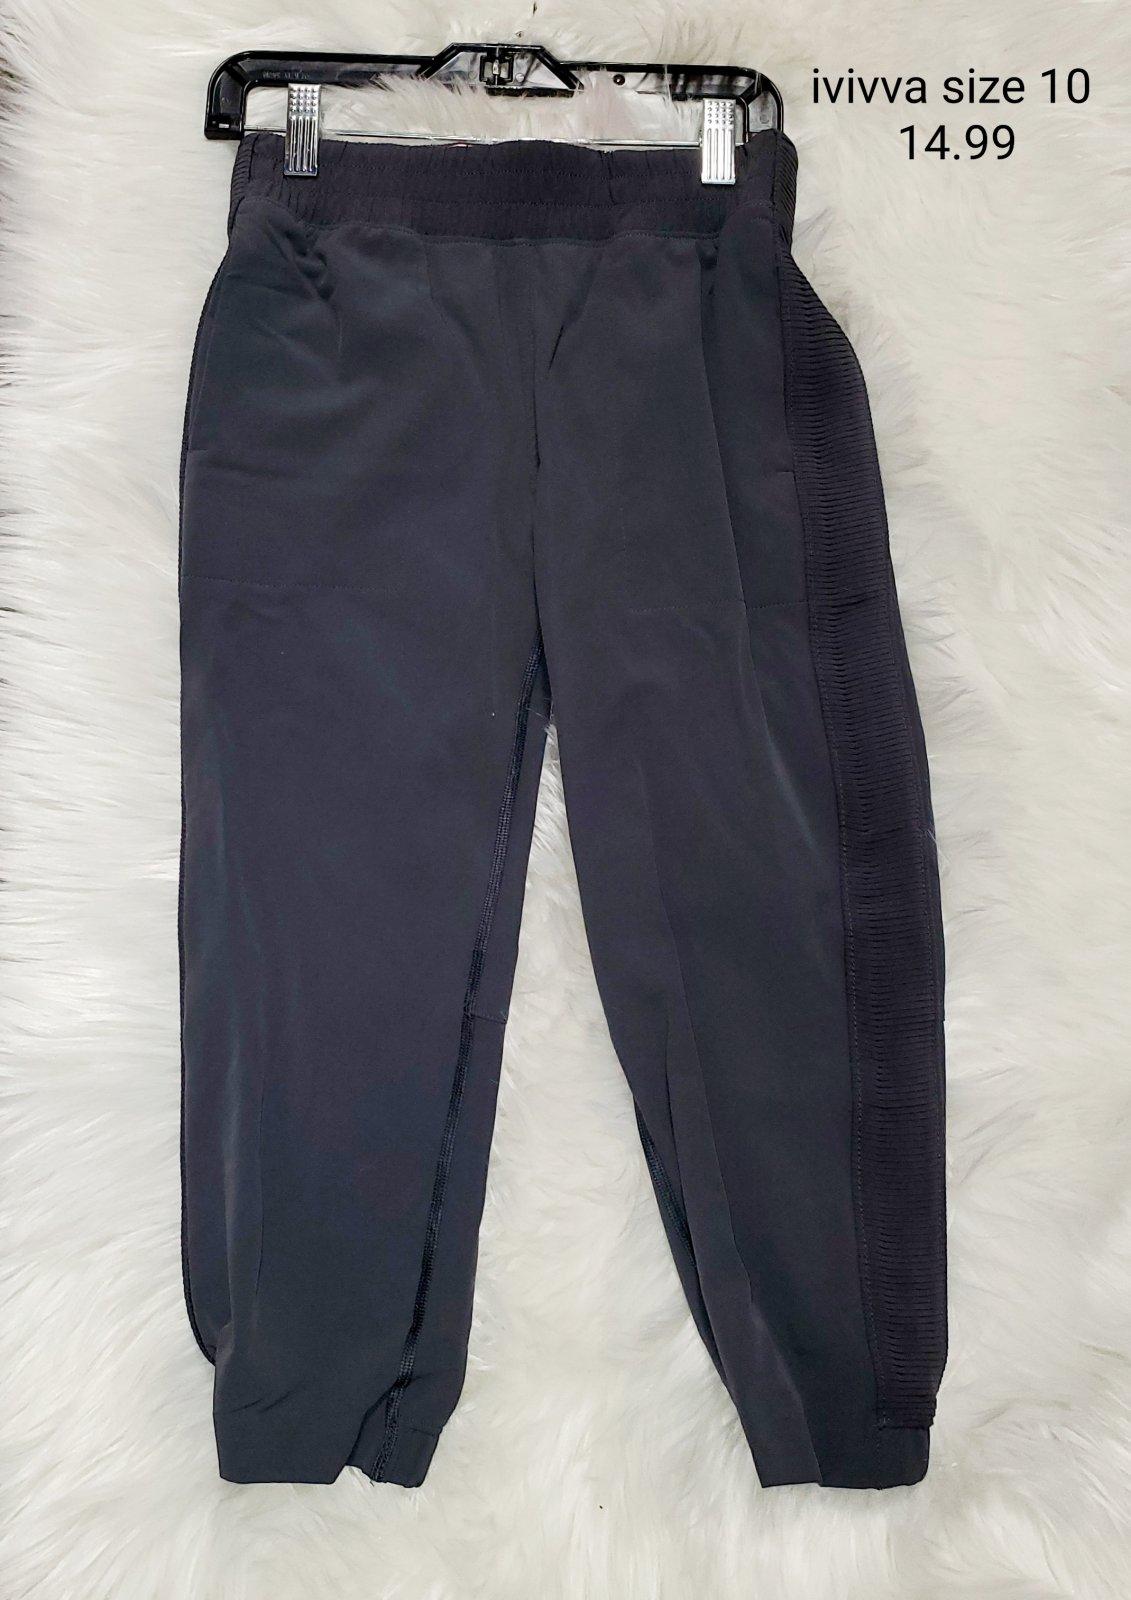 Ivivva athletic pants grey girls size 10